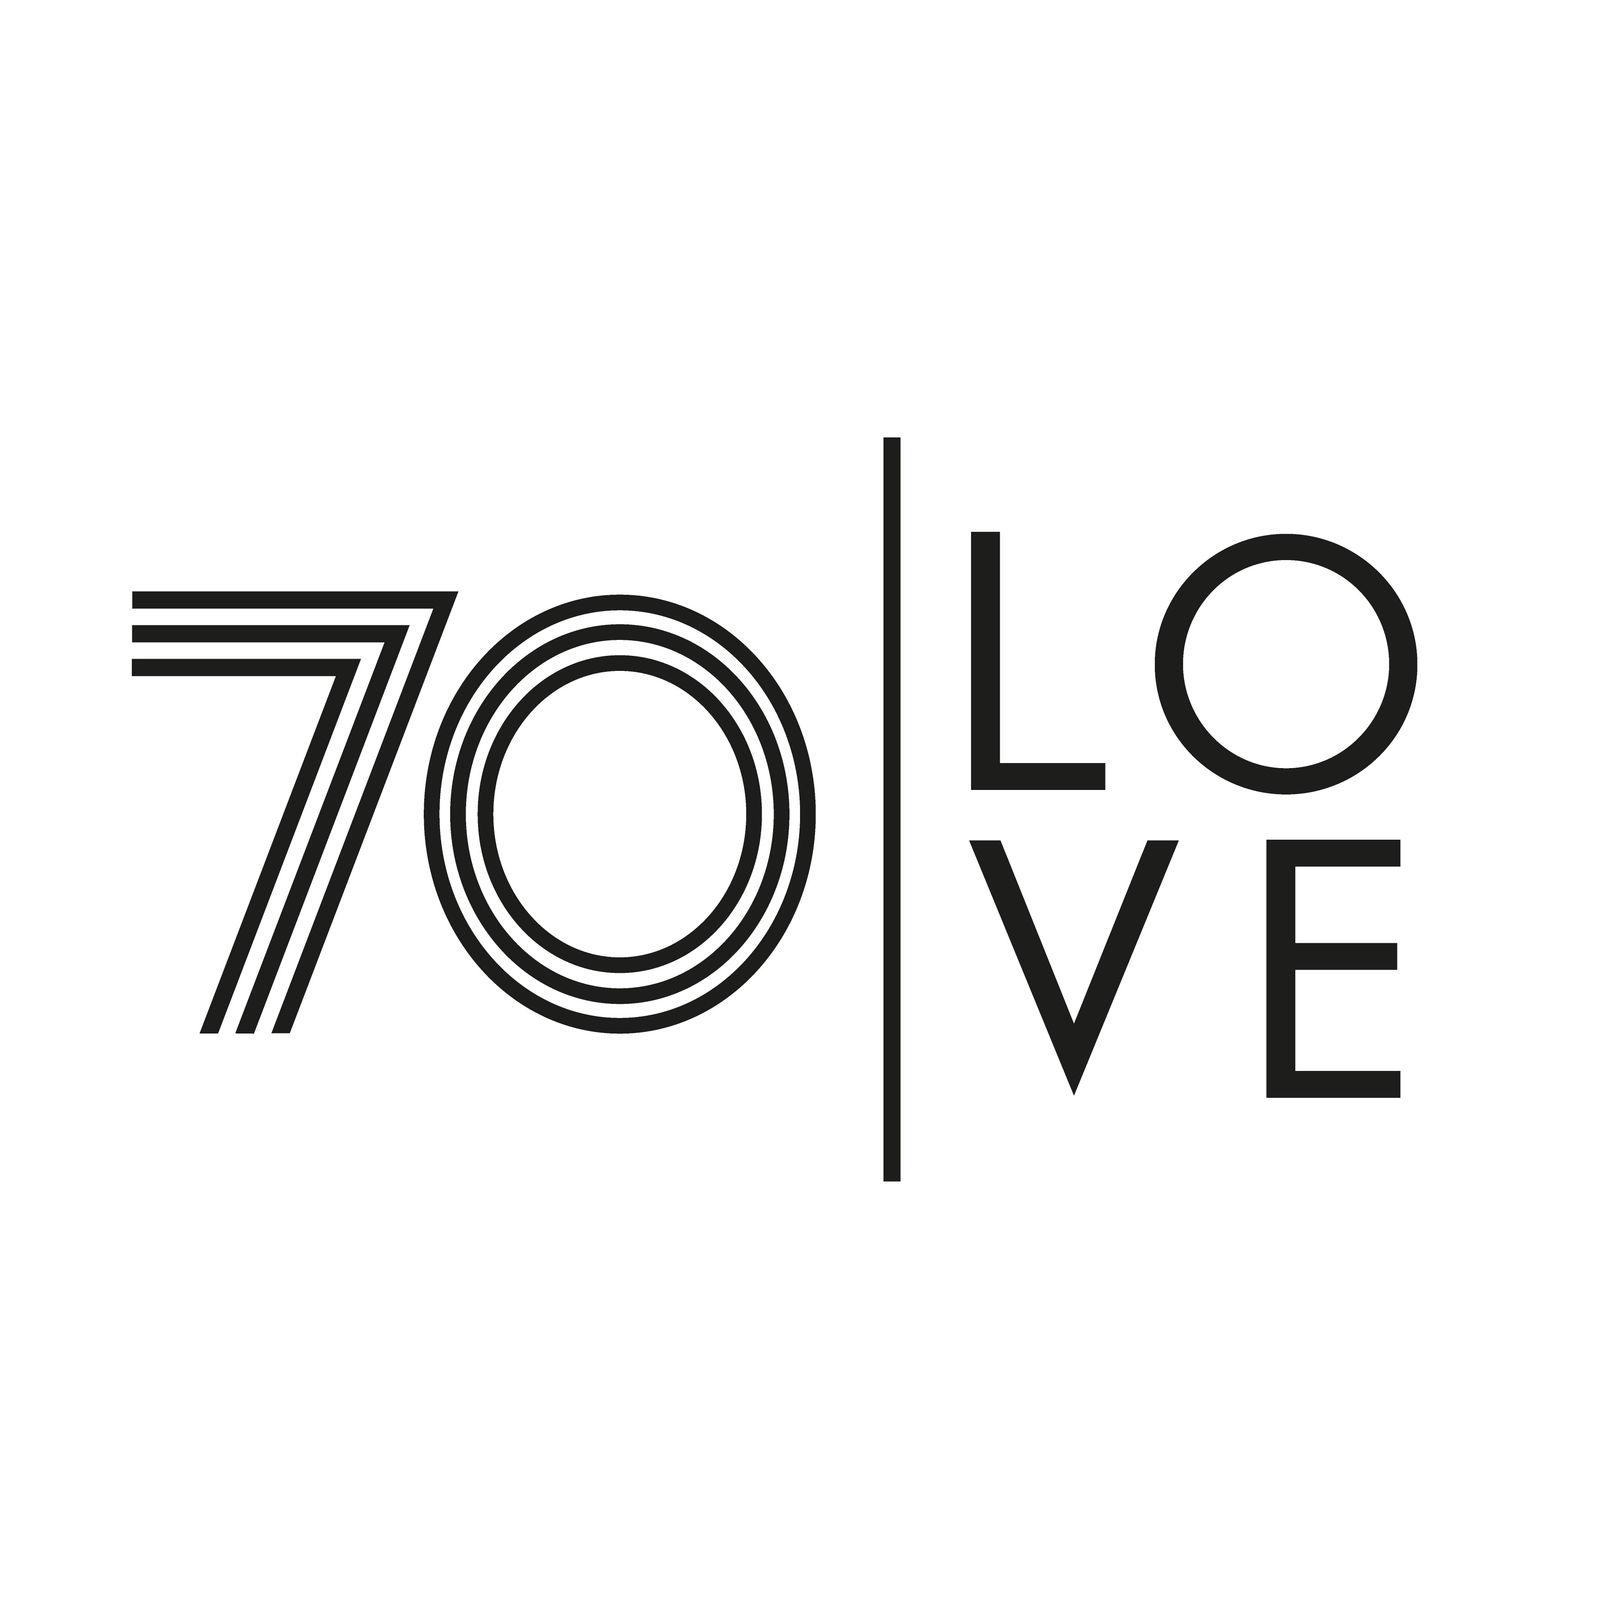 70 LOVE (Bild 1)